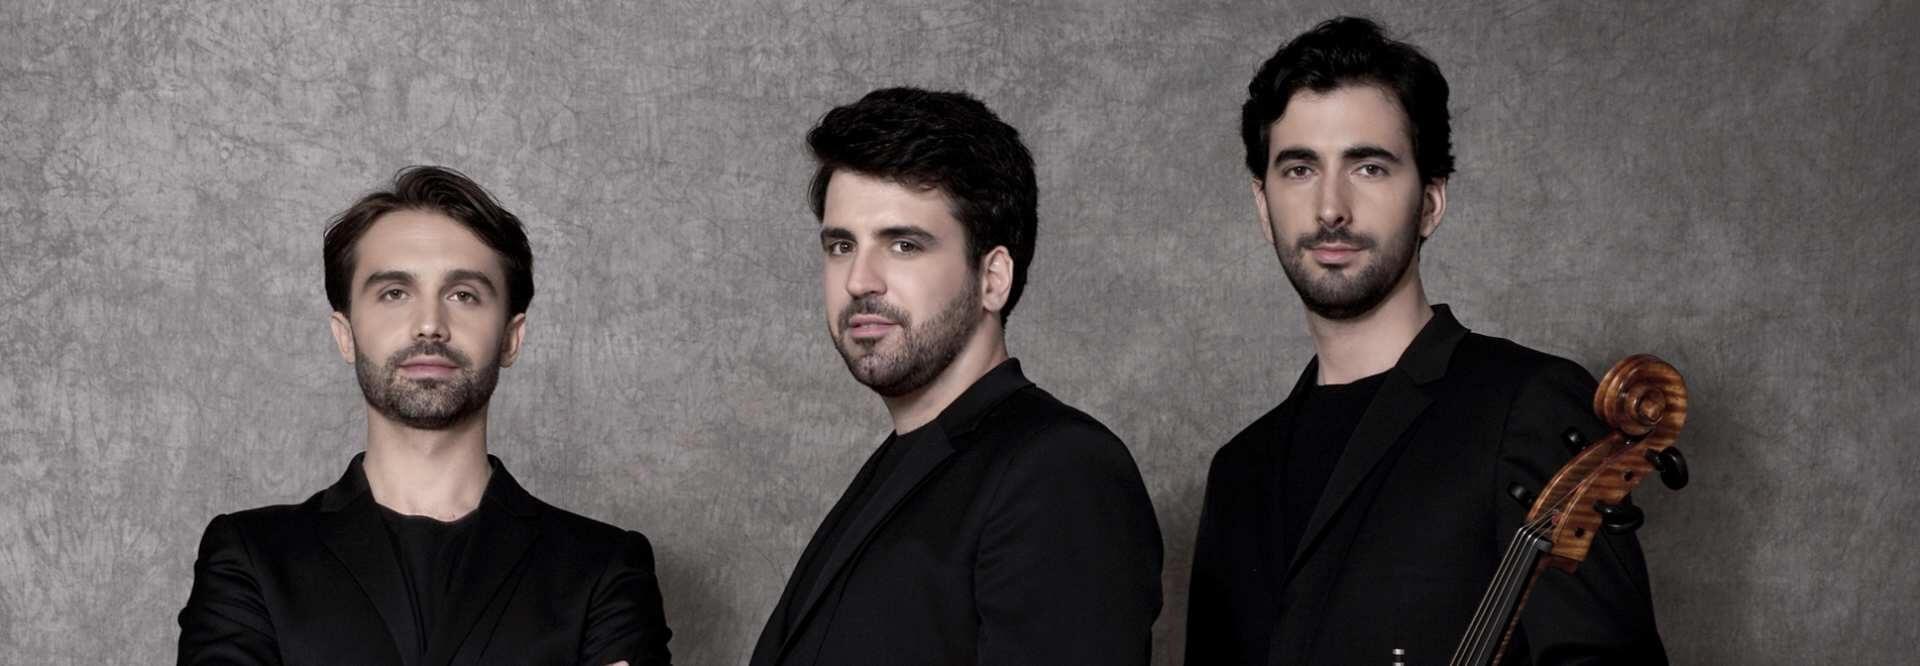 Trio Zadig met Rachmaninoff, Beethoven en Dvořák